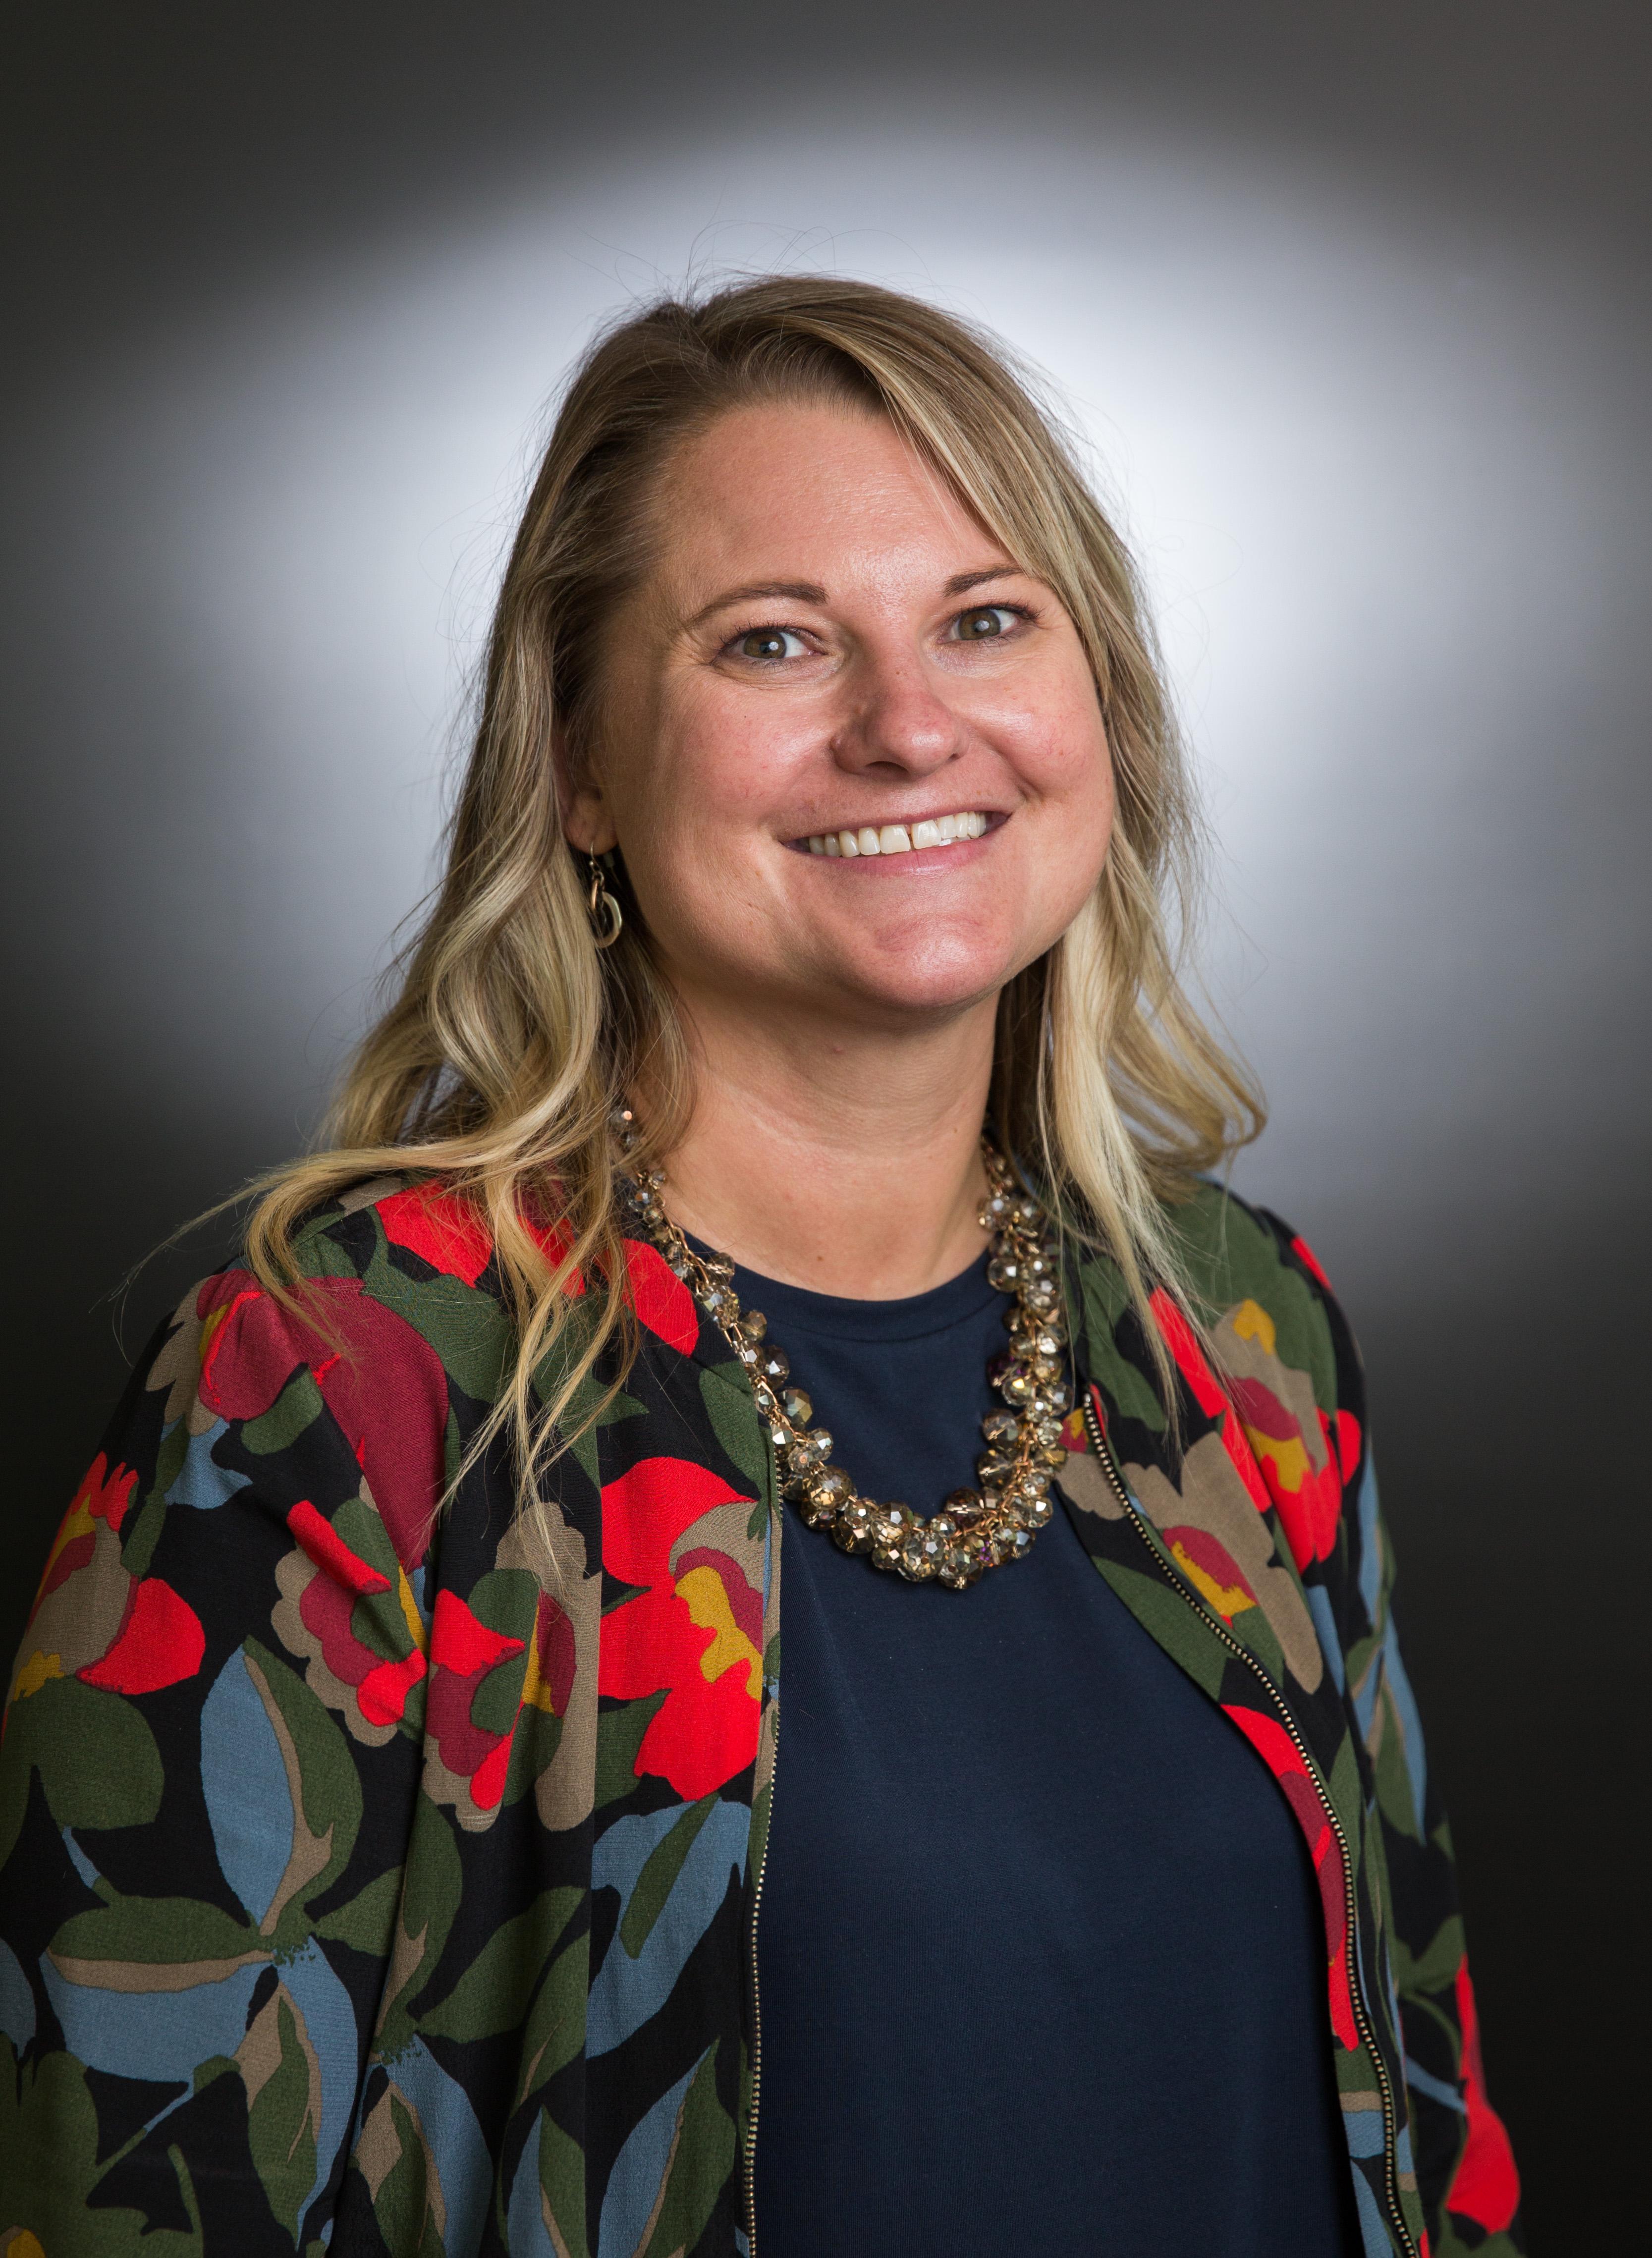 Profile photo of Stephanie Stone